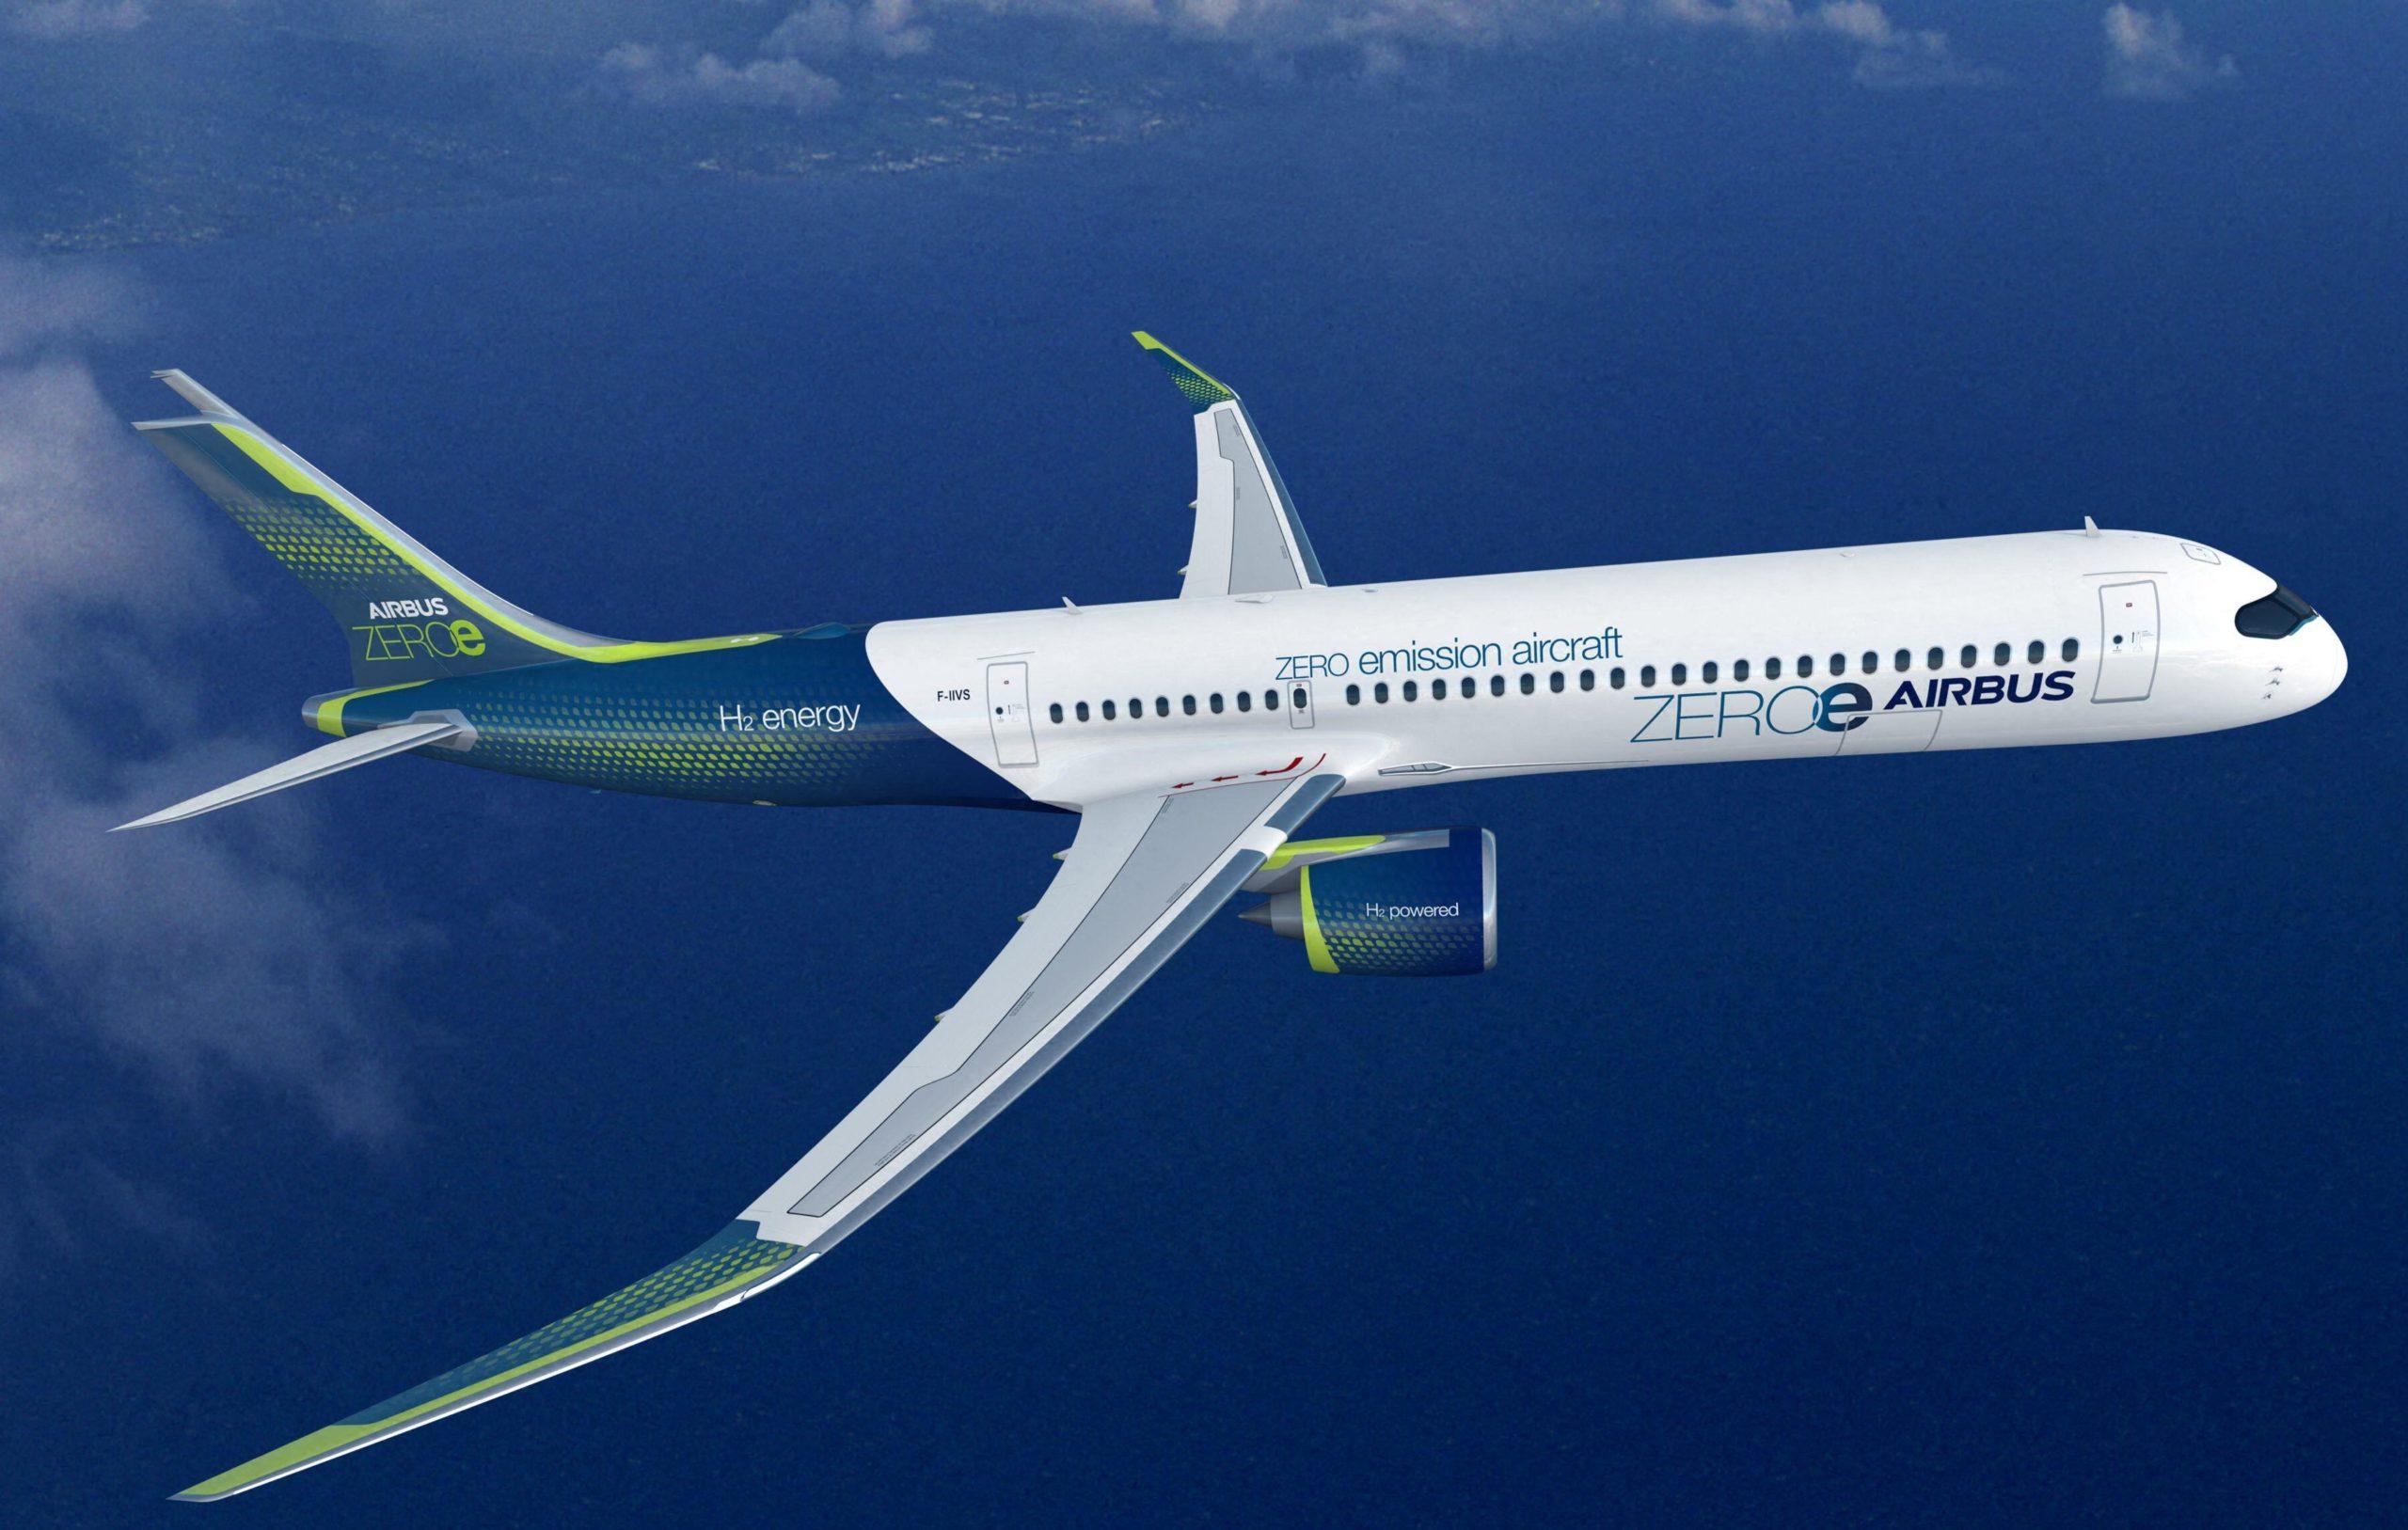 ZEROe Airbus concept aircraft